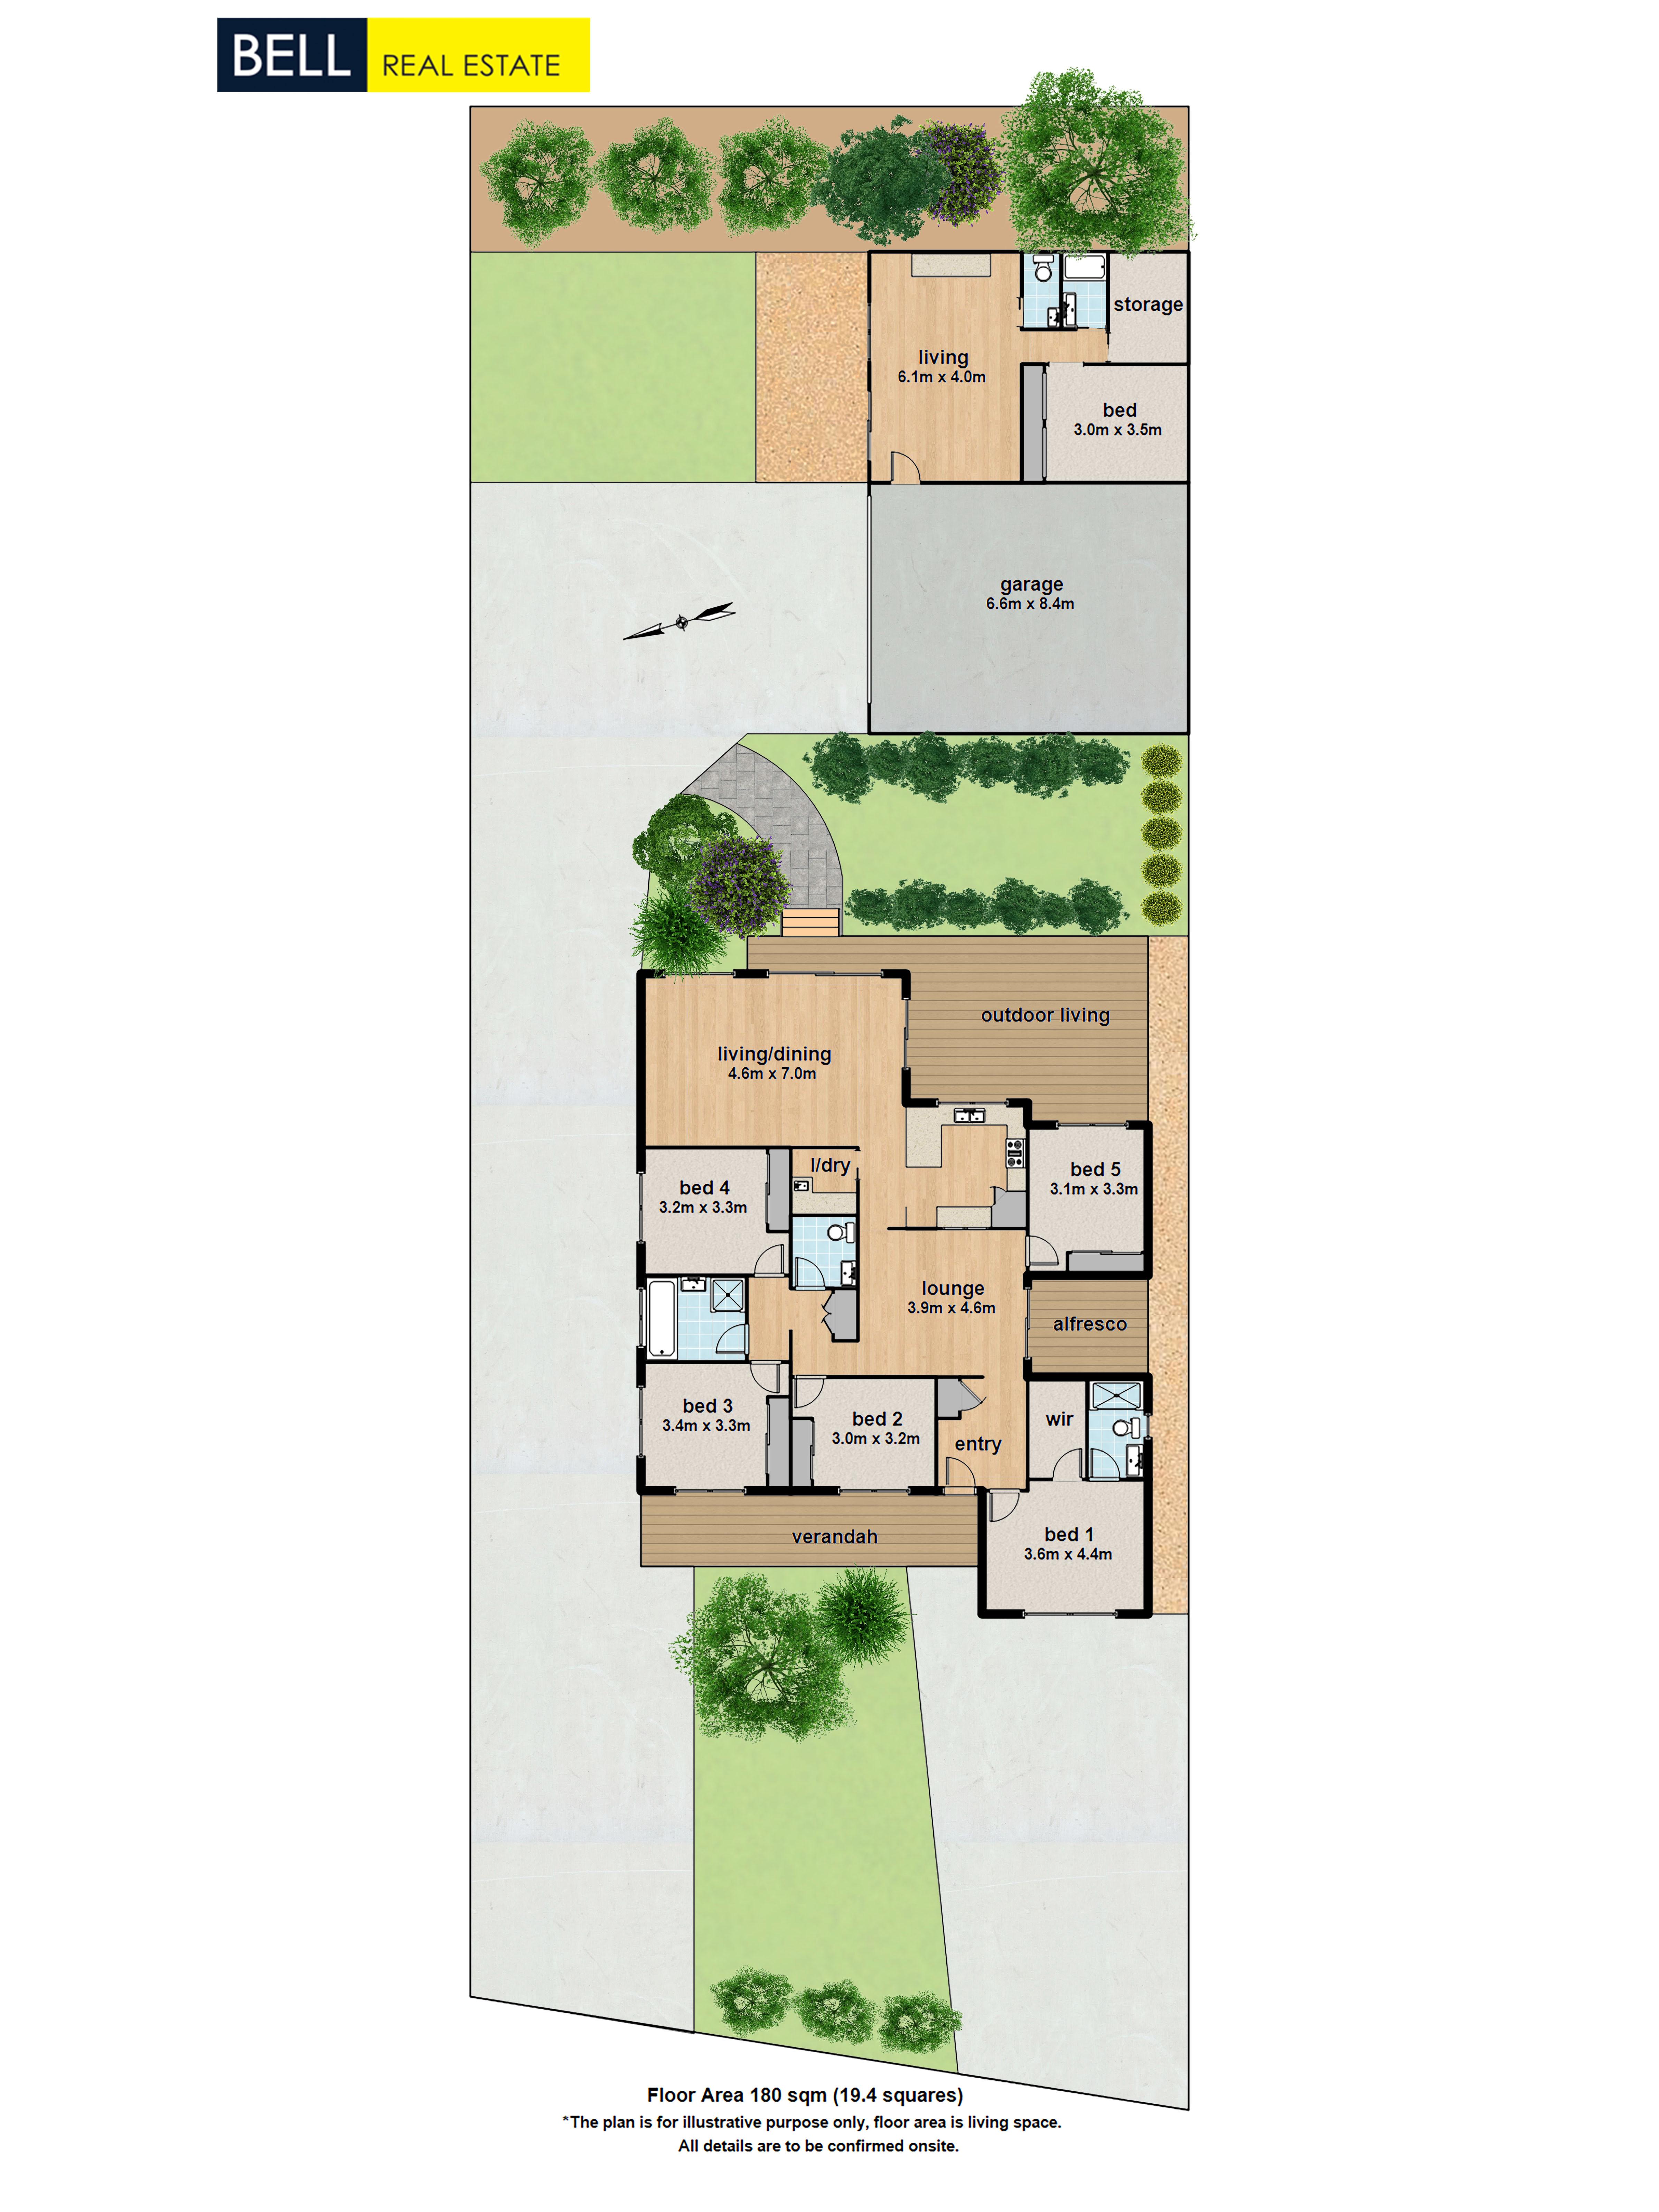 https://assets.boxdice.com.au/bell_re/listings/17831/7cbaa886.jpg